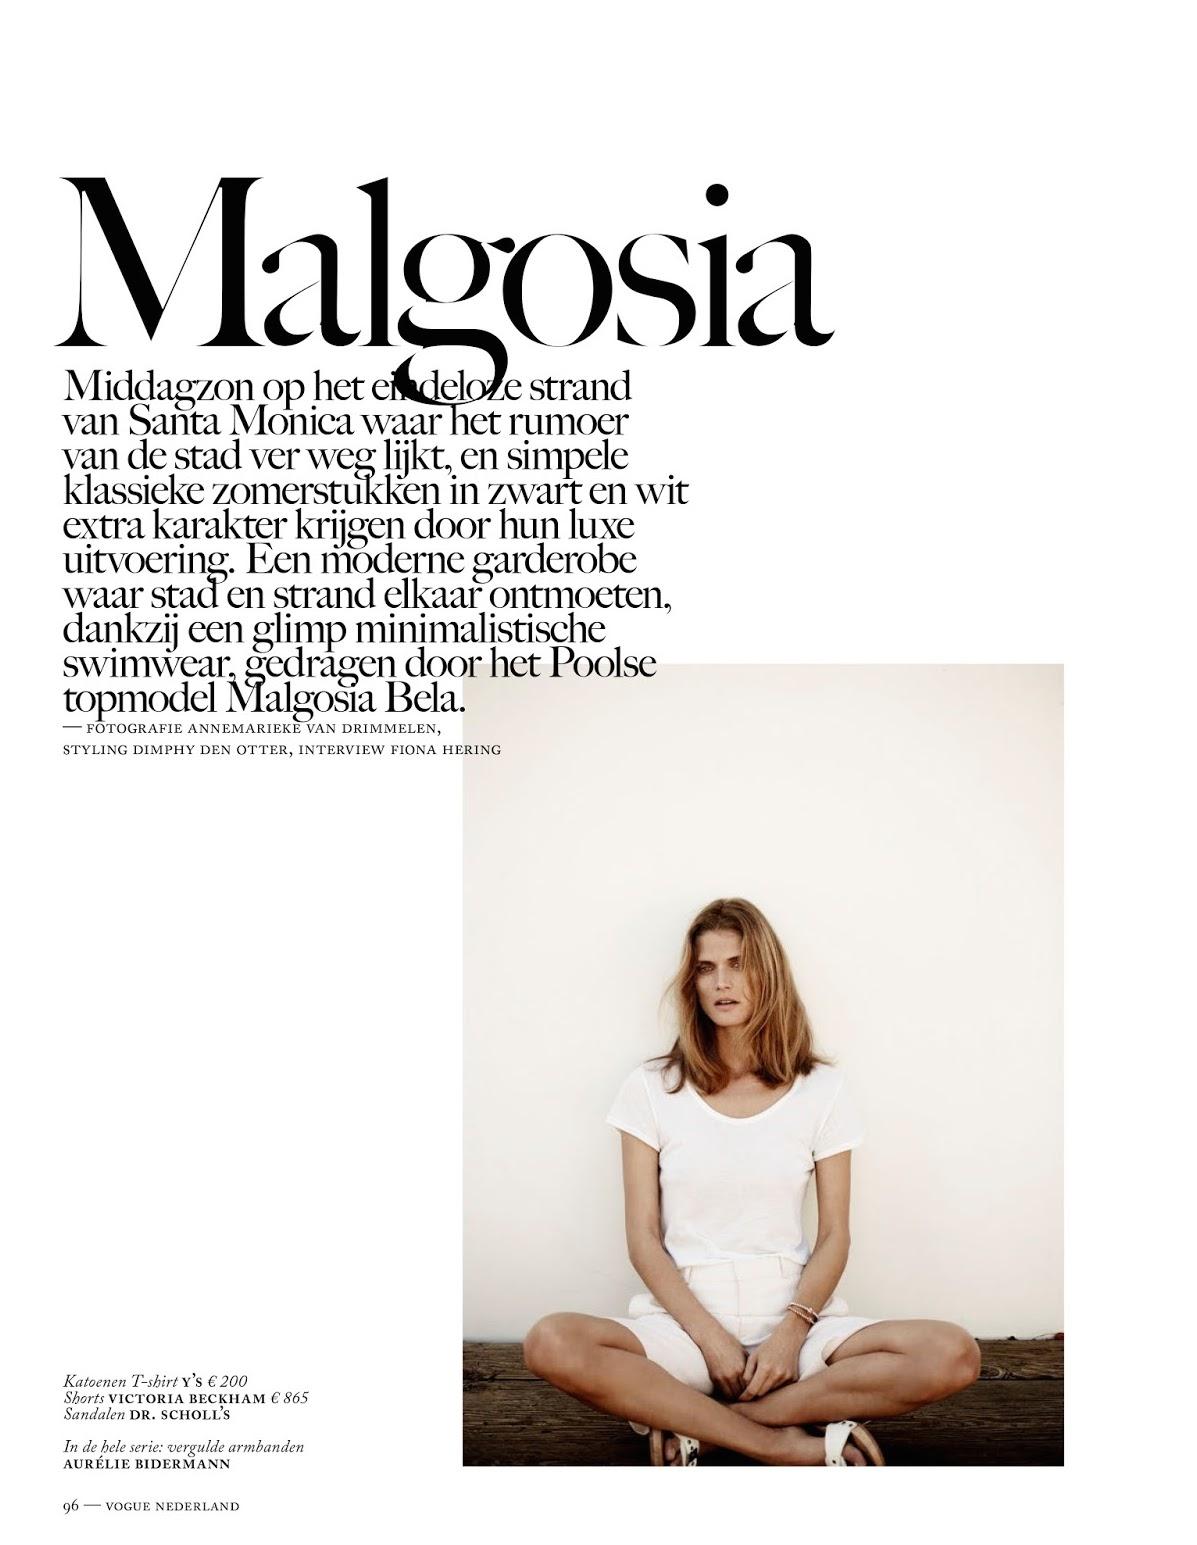 dress - Bela malgosia vogue netherlands julyaugust video